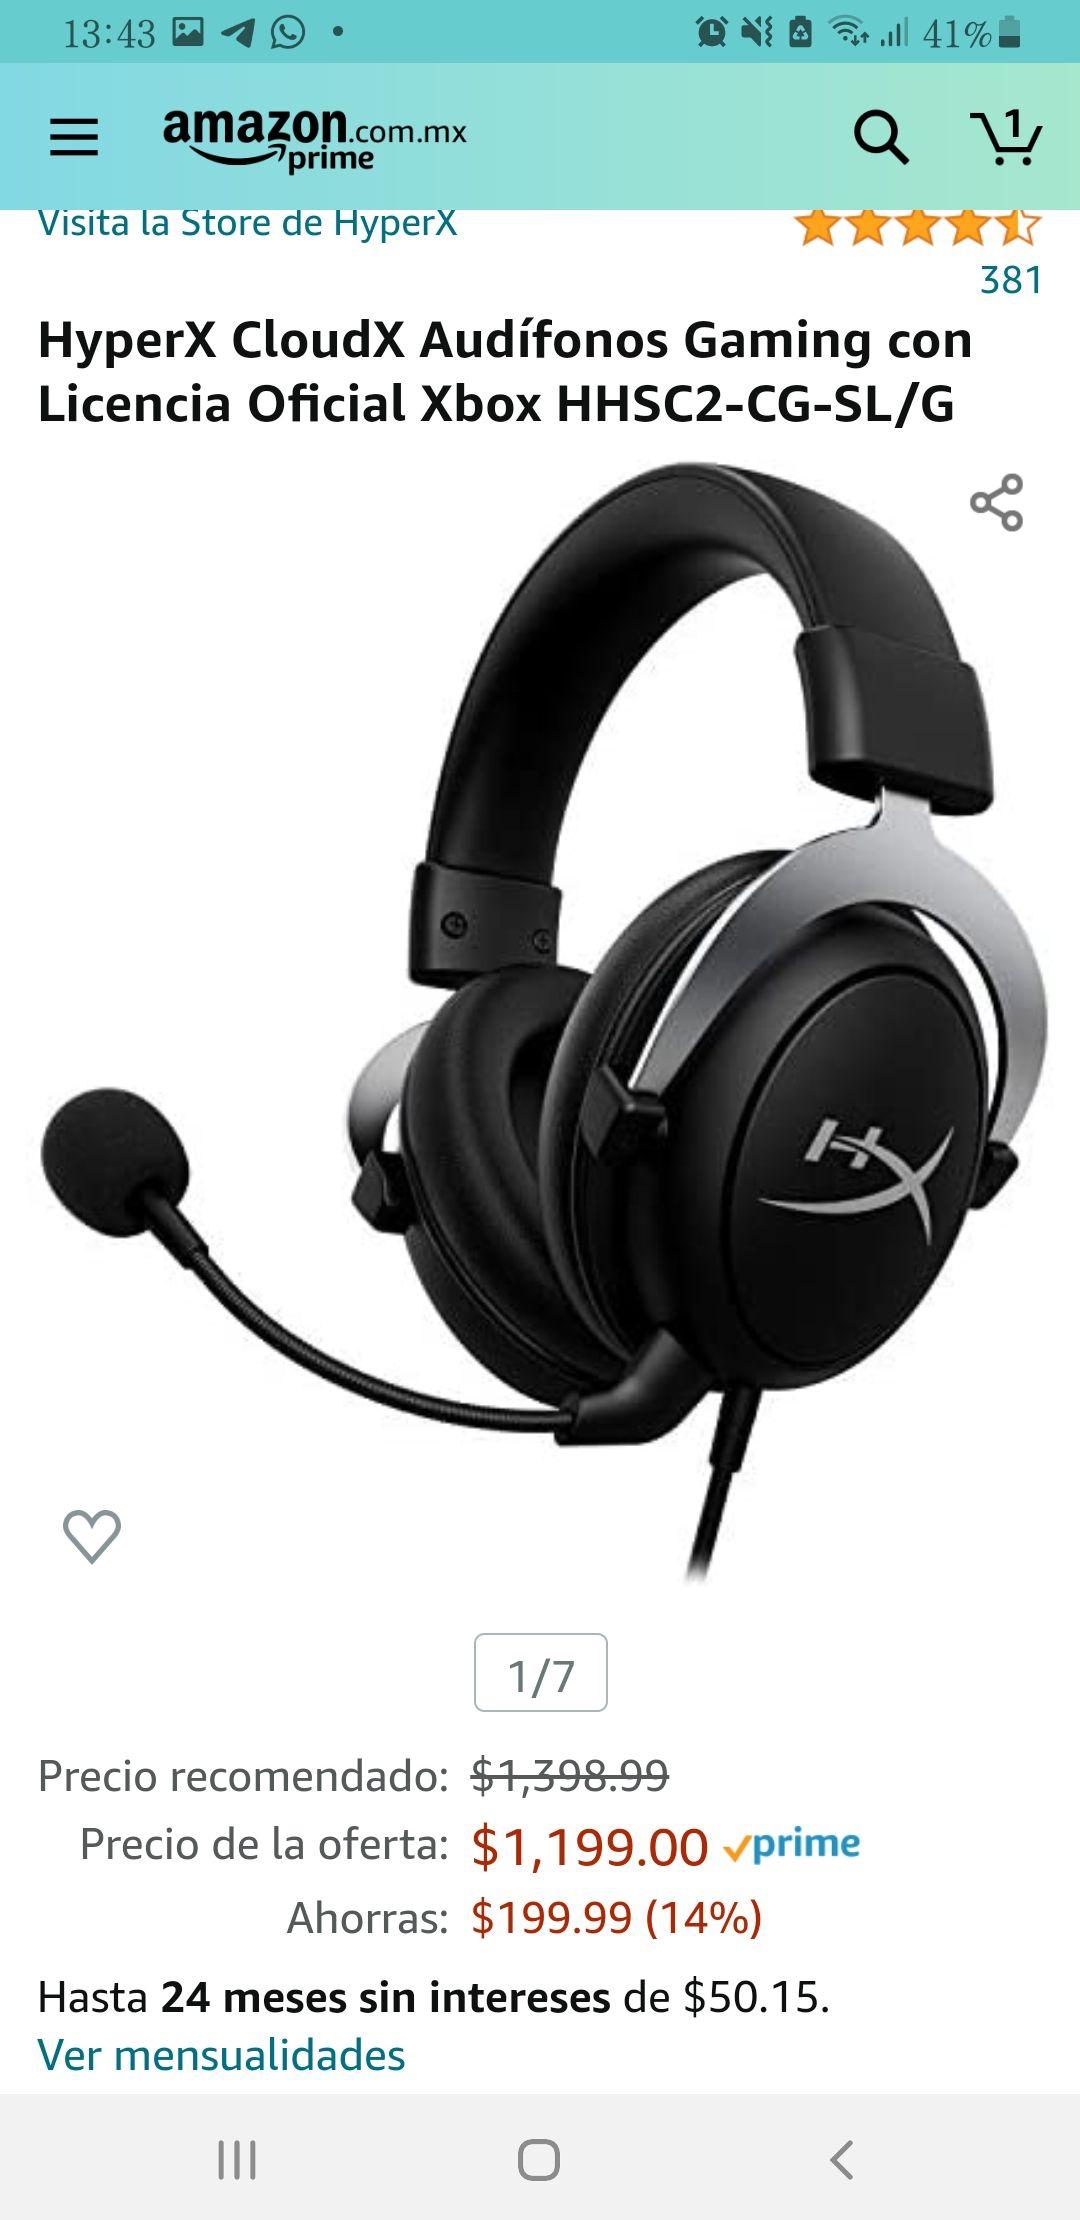 Amazon: HyperX CloudX Audífonos Gaming con Licencia Oficial Xbox HHSC2-CG-SL/G (Precio más barato según investigue en keepa.)